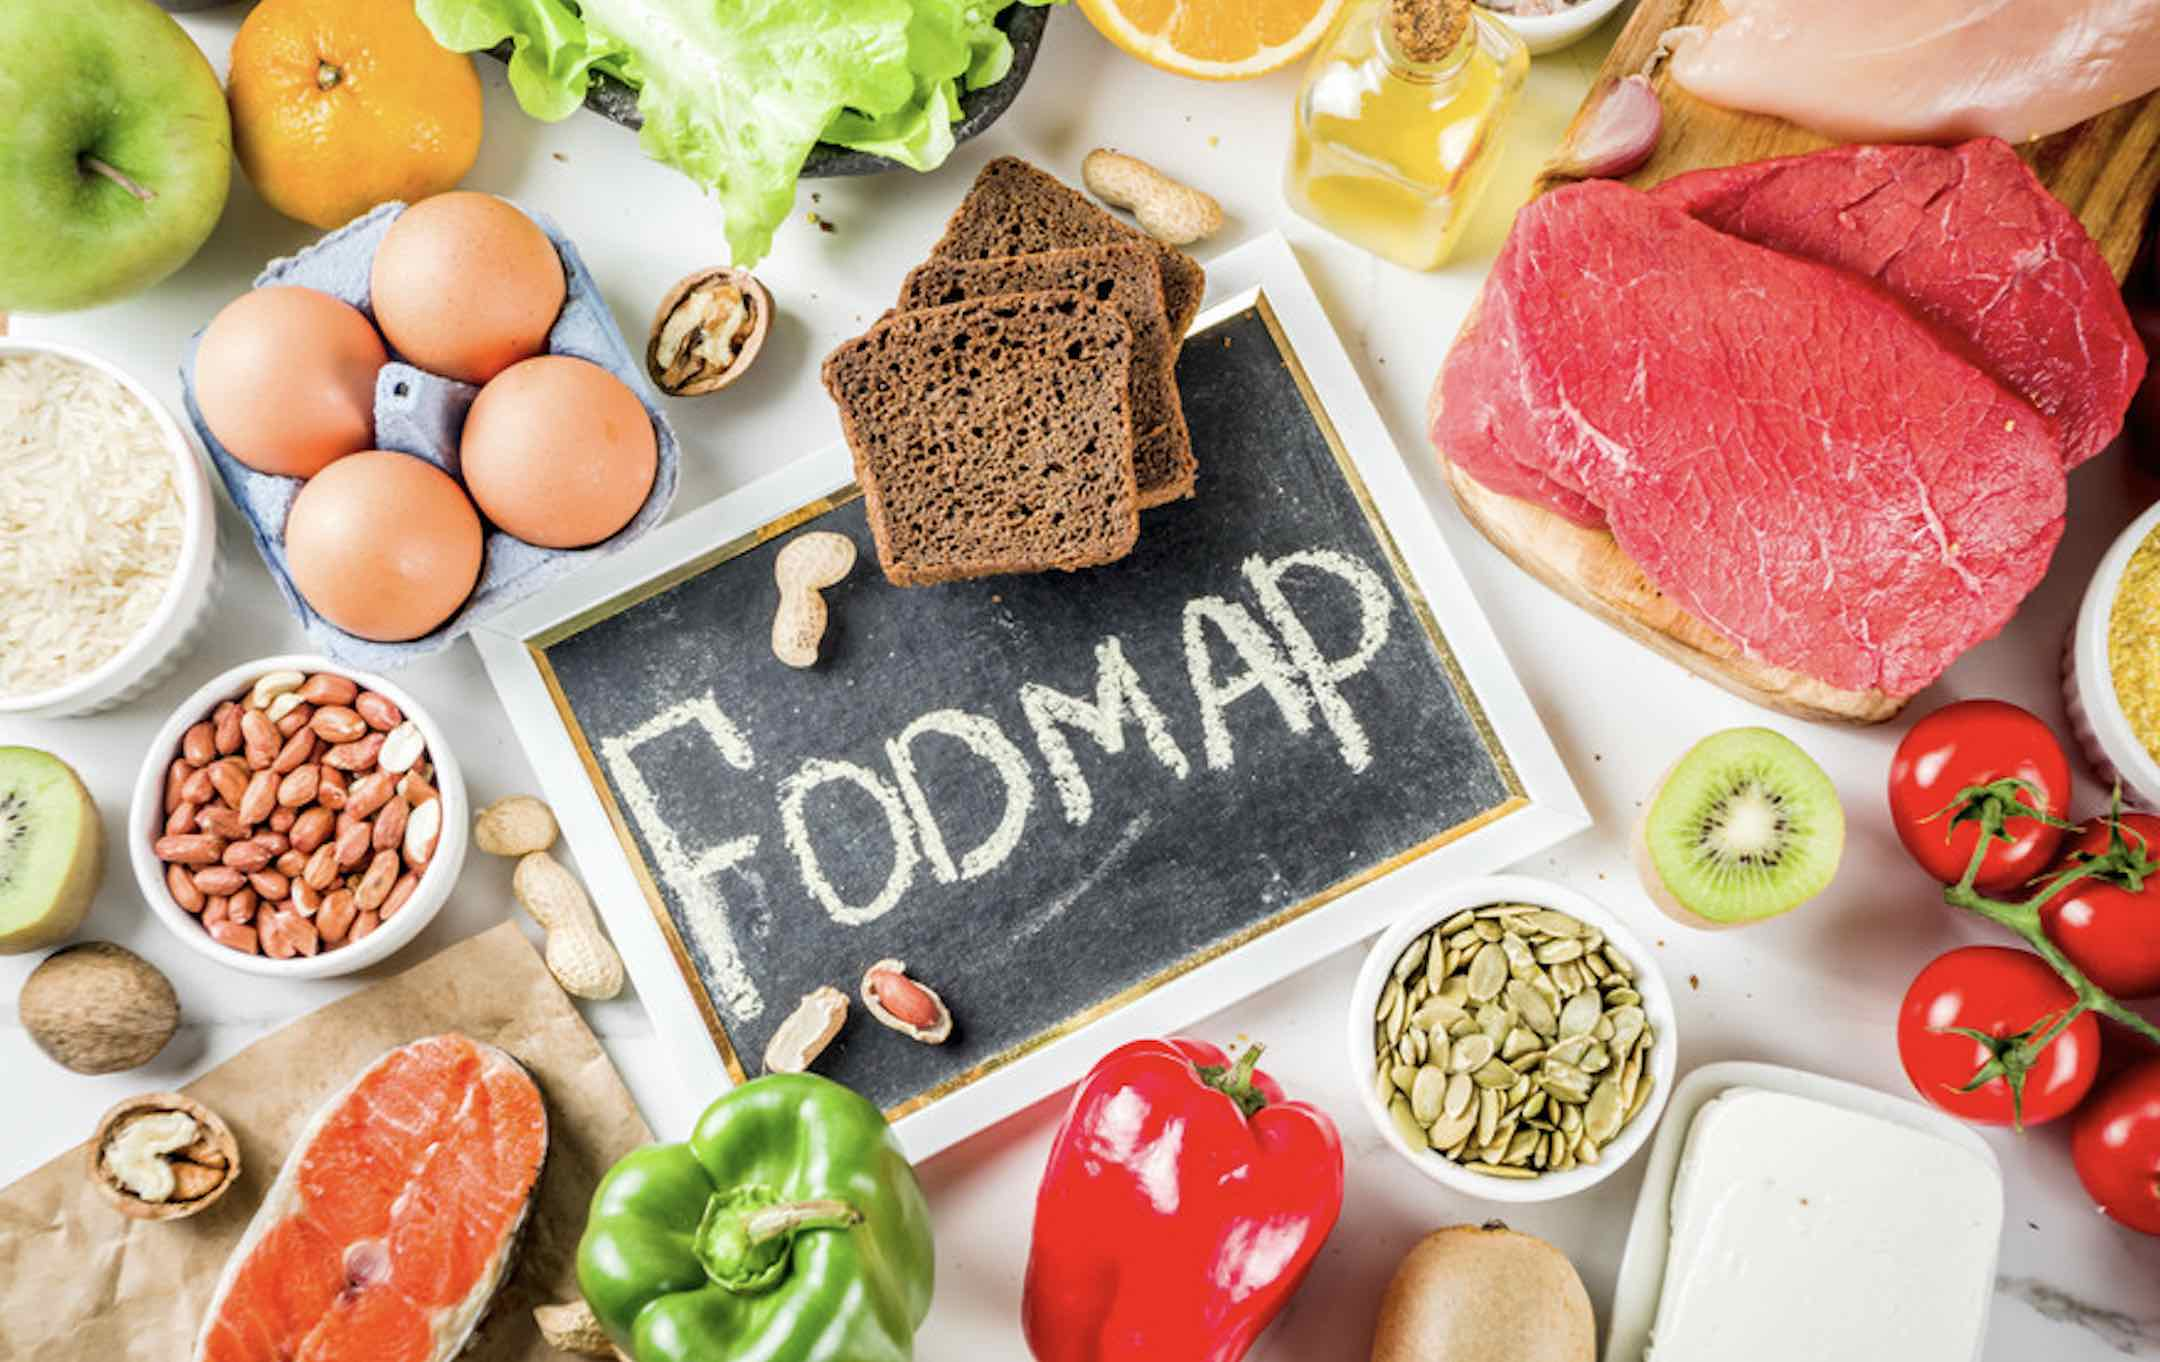 Fodmap healthy diet food - Diet&cie